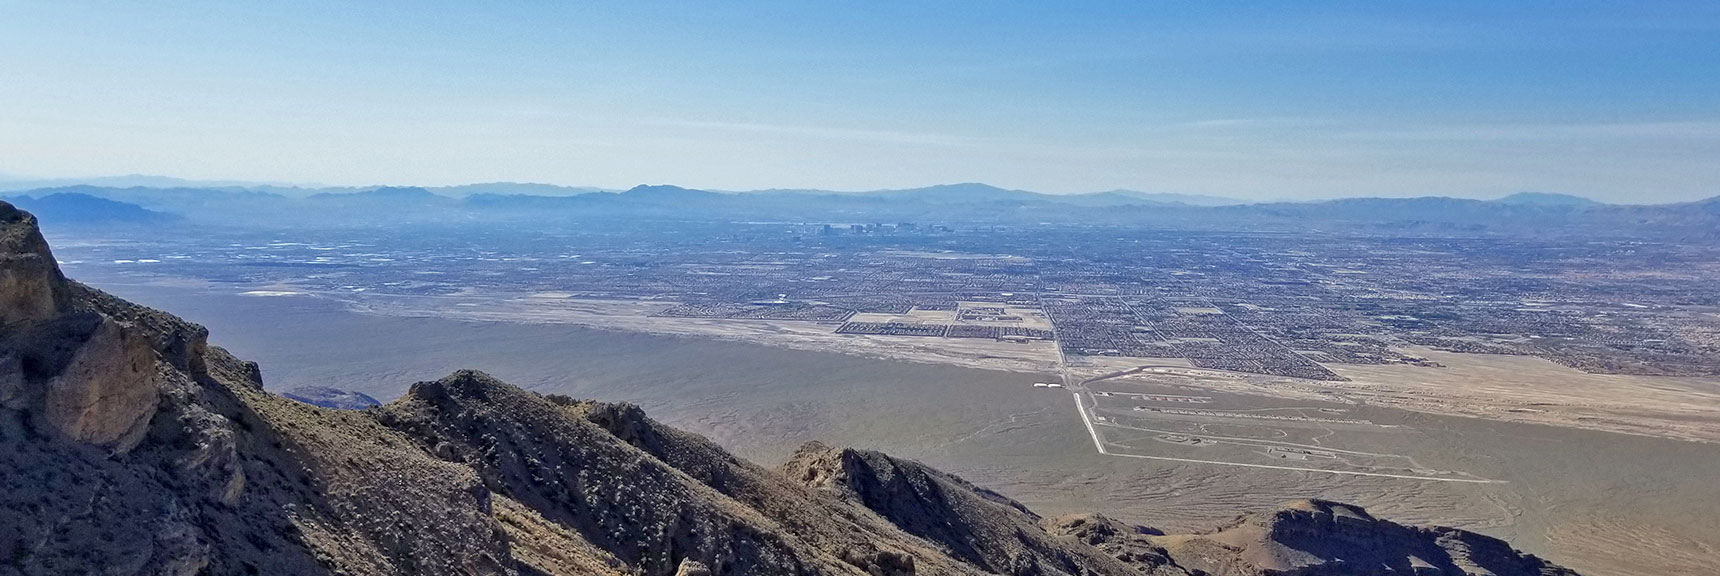 View of Las Vegas Upon Topping the Mid-Summit Ridge| Gass Peak Eastern Summit Ultra-marathon Adventure, Nevada